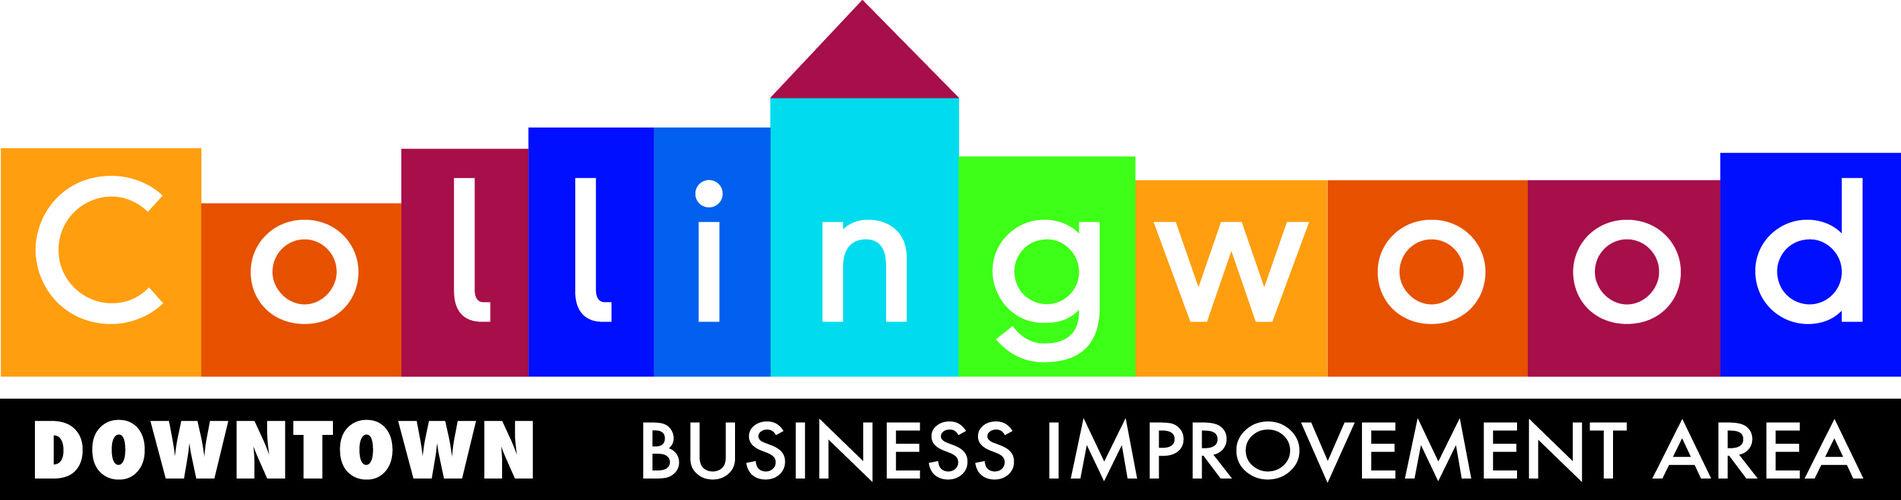 Collingwood Business Improvement Area